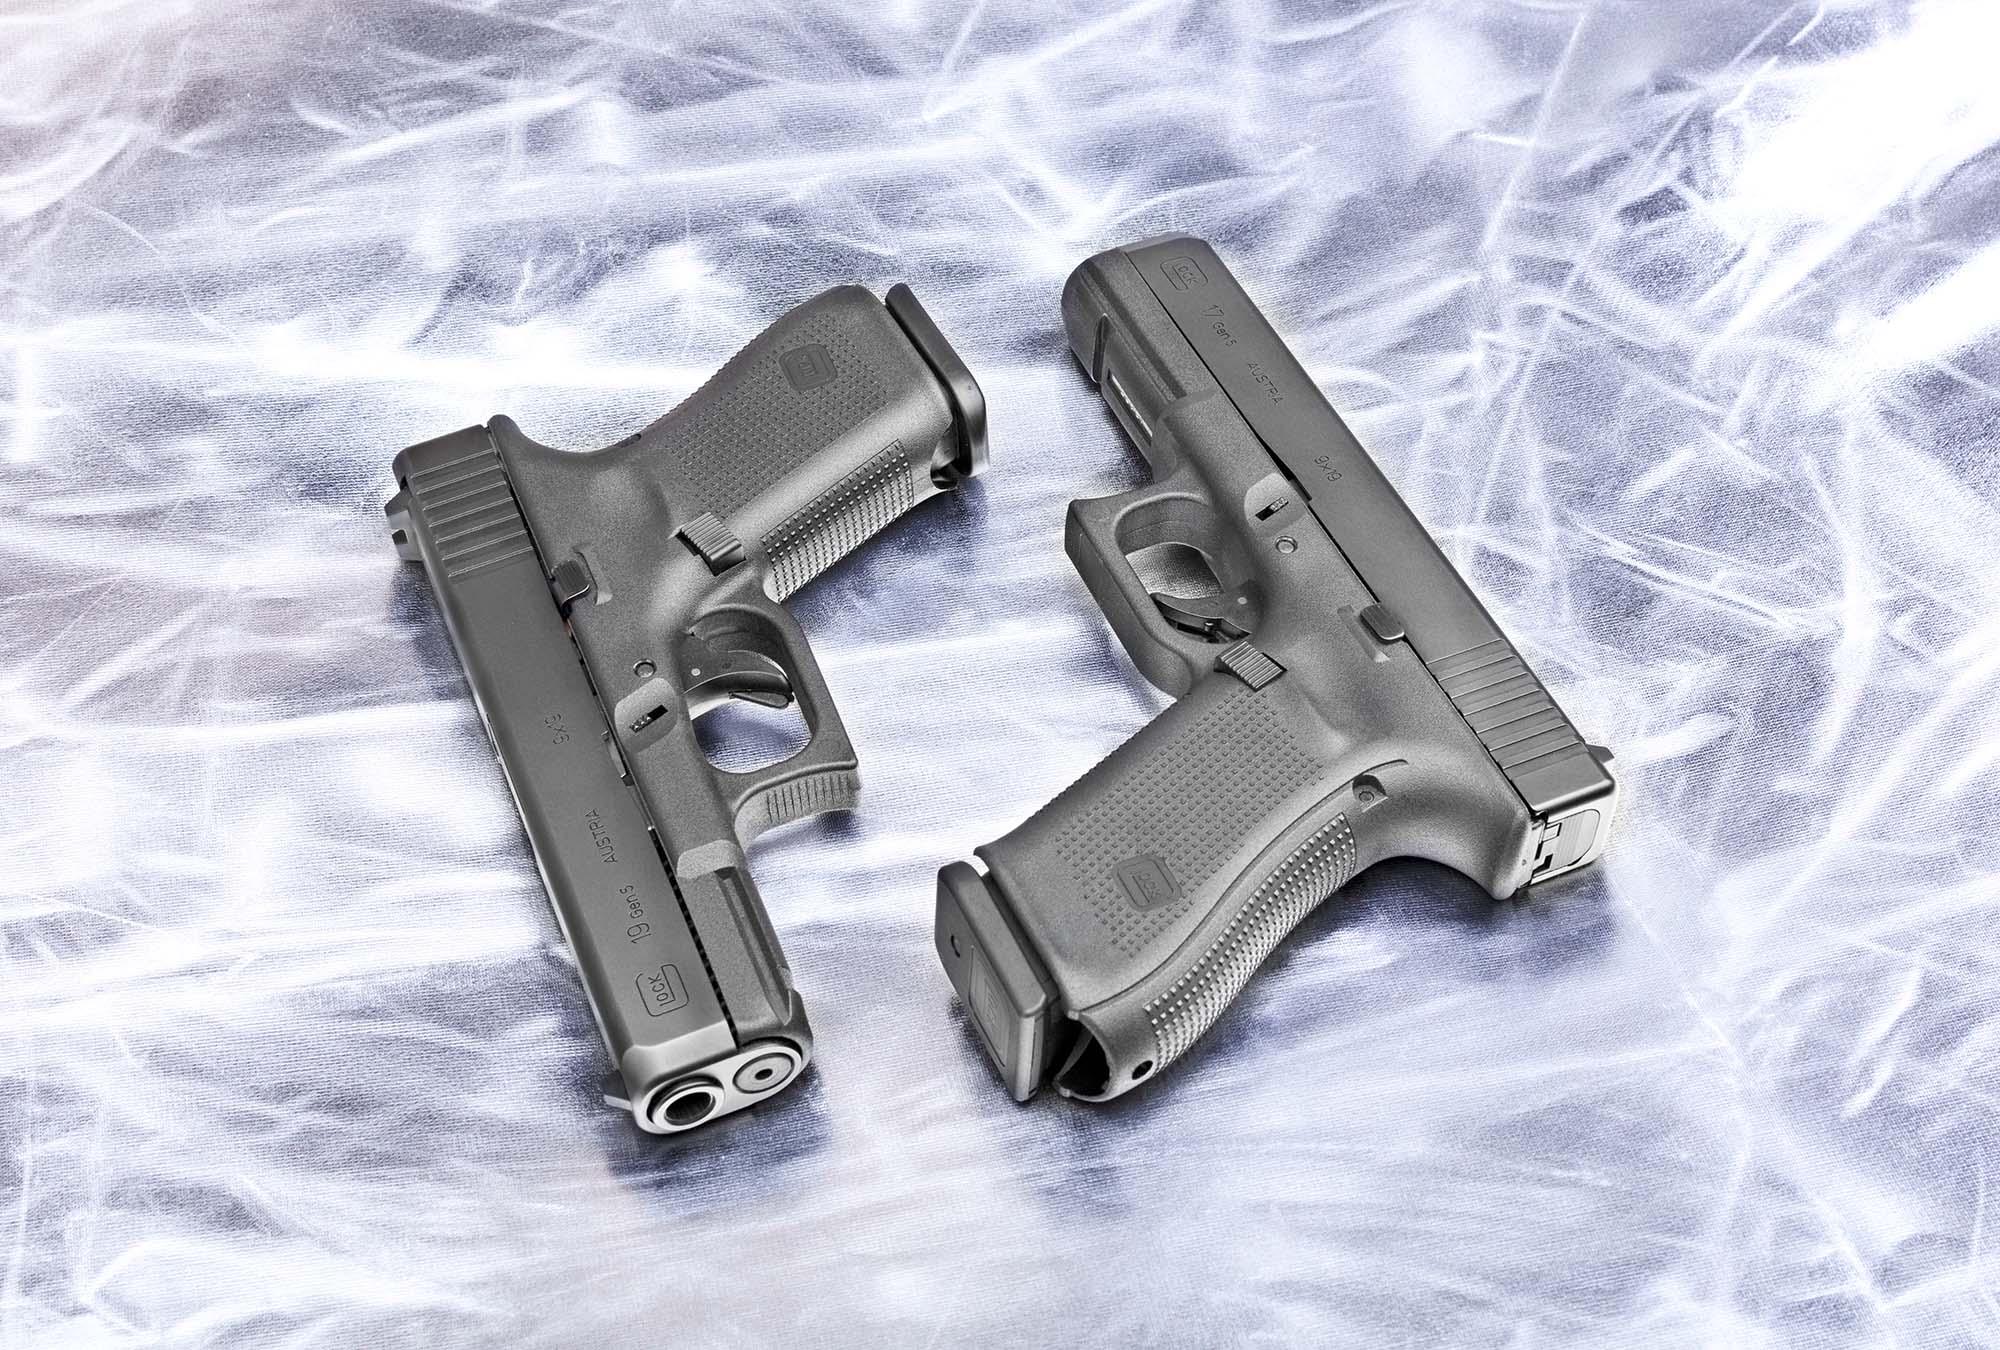 Glock Gen5: the new generation | GUNSweek com